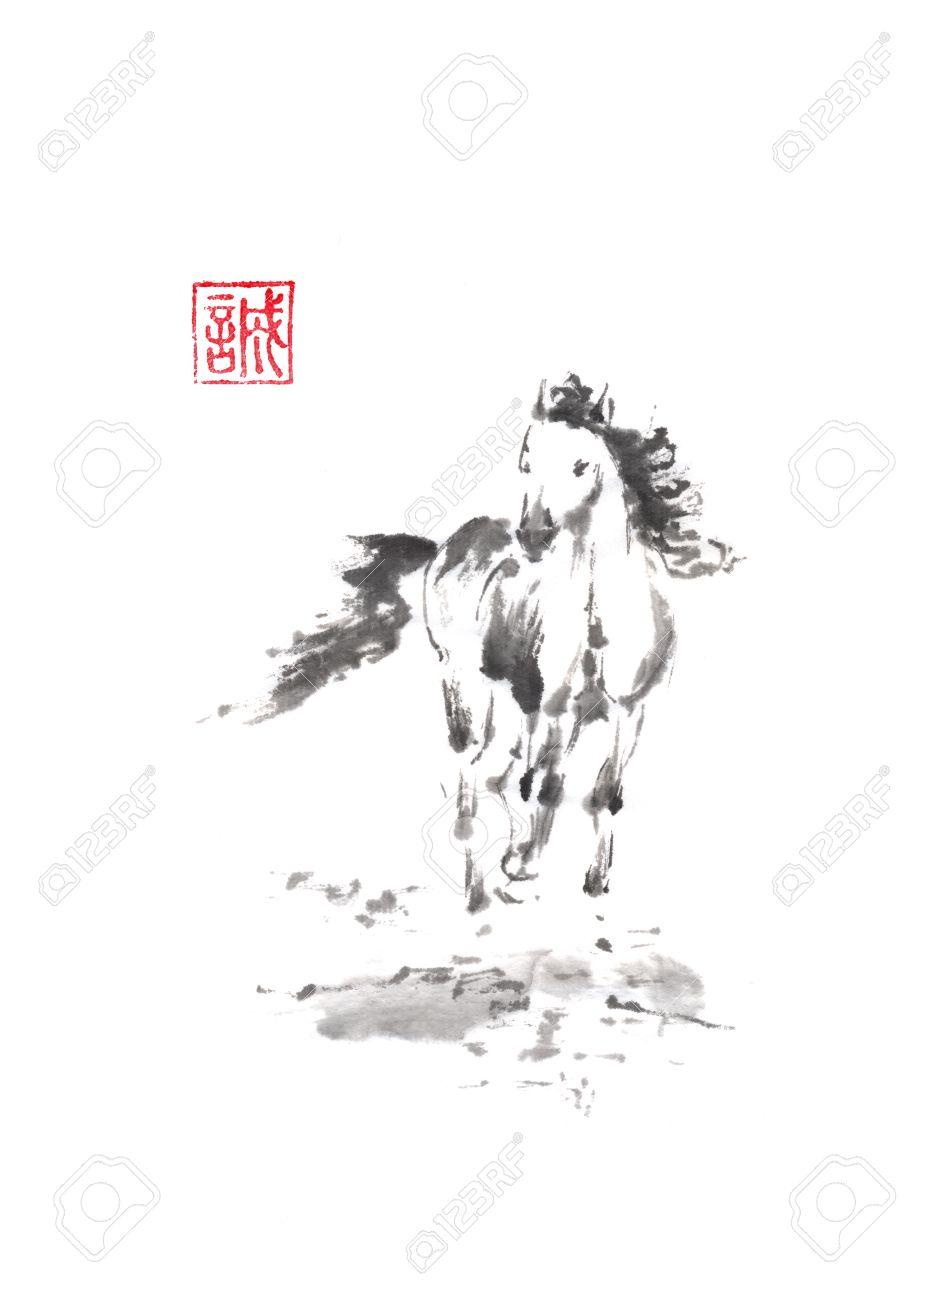 Running horse Japanese style original sumi-e ink painting  Hieroglyph